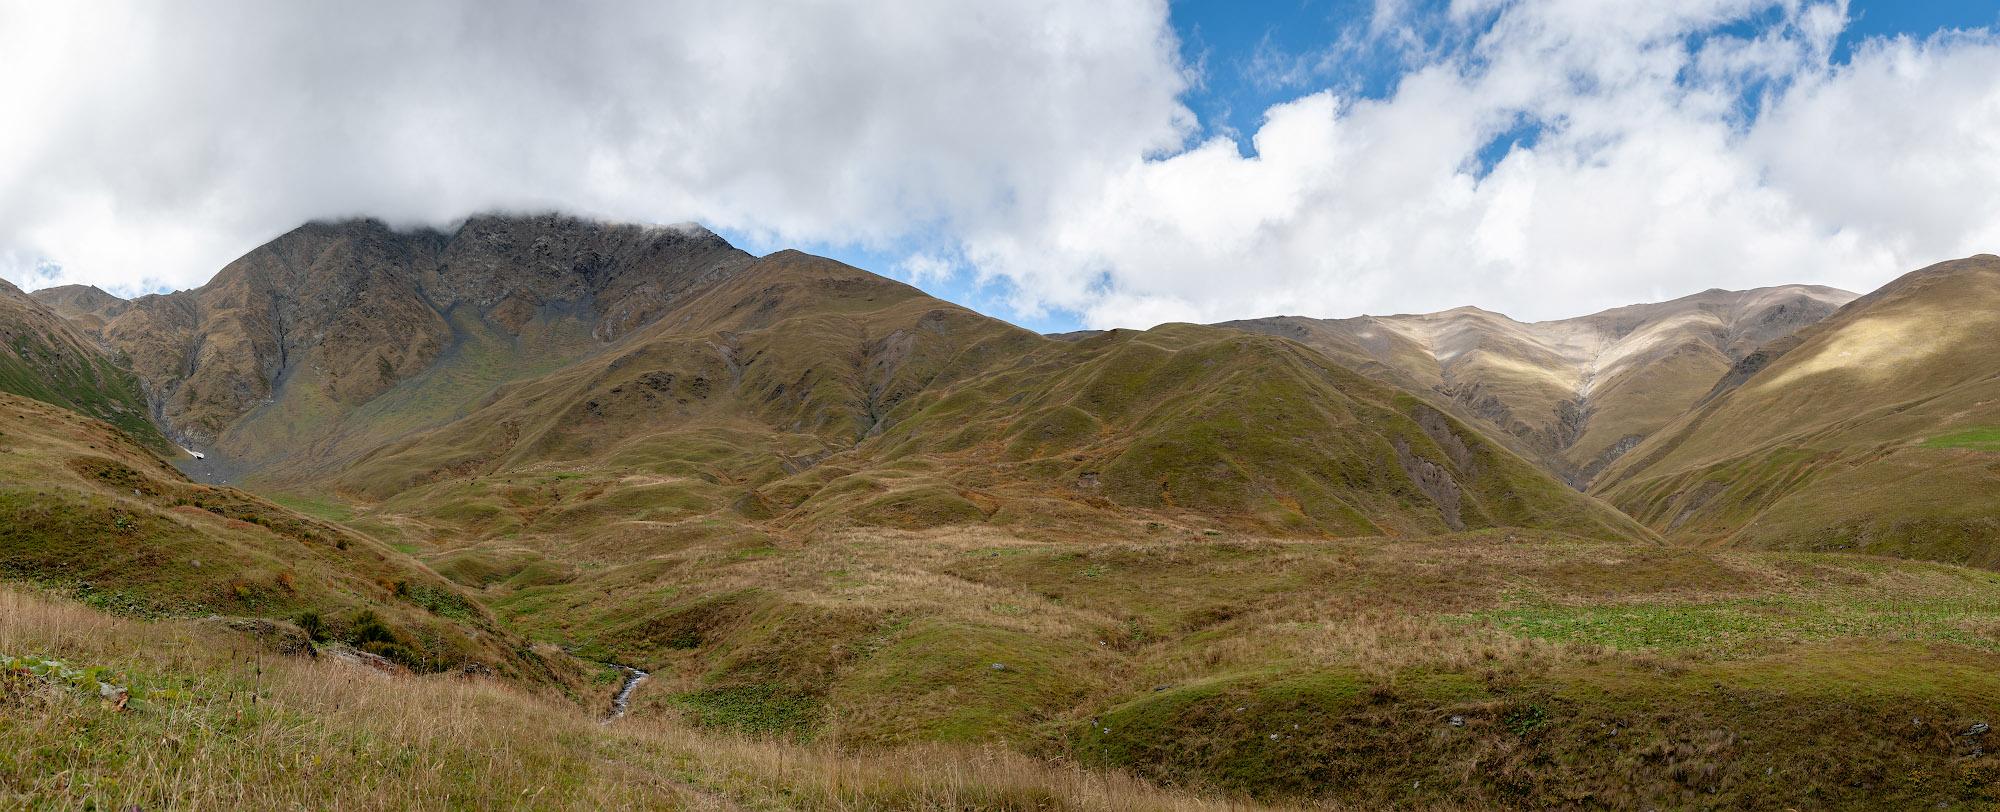 Панорама спуска с перевала